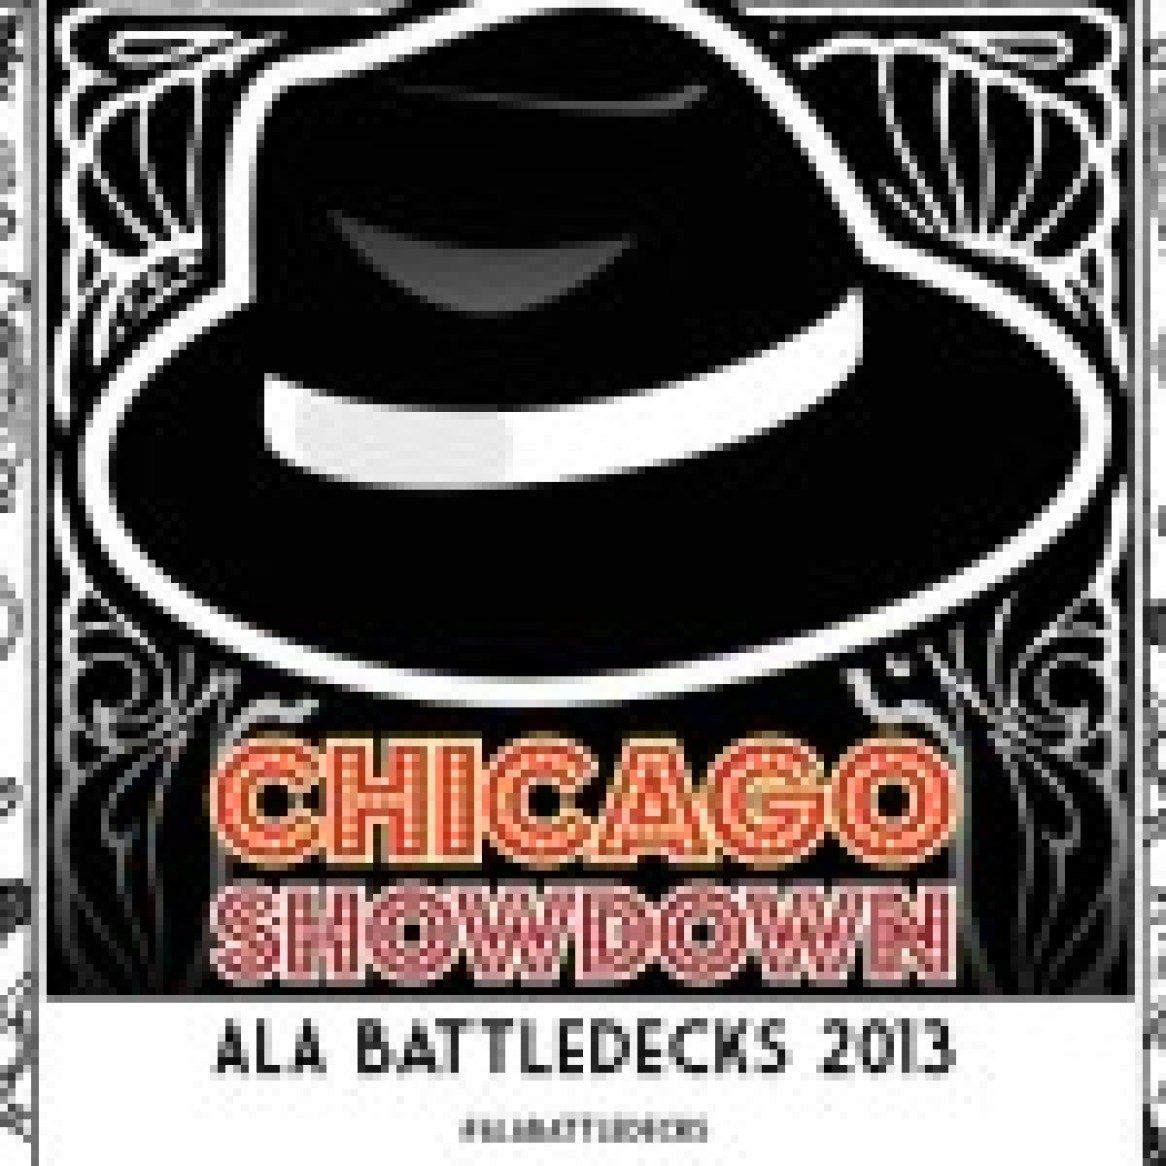 ALA-Battledecks-Chicago-Showdown-by-John-LeMasney-via-lemasney.com_-150x150